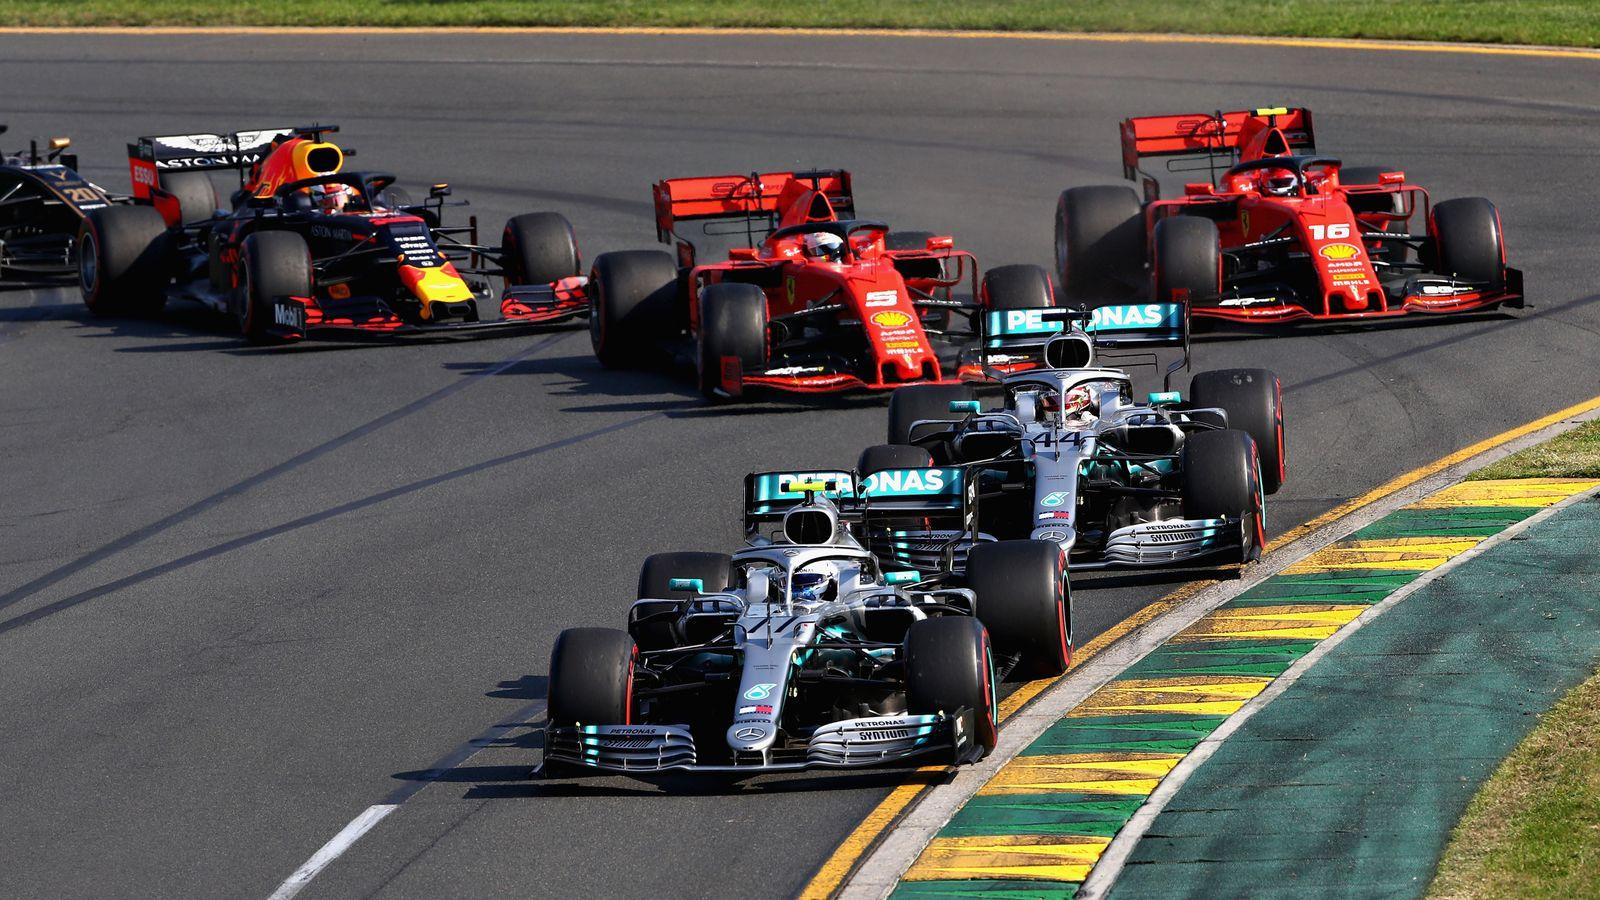 F1 2020 Australian Gp To Open Next Season On March 15